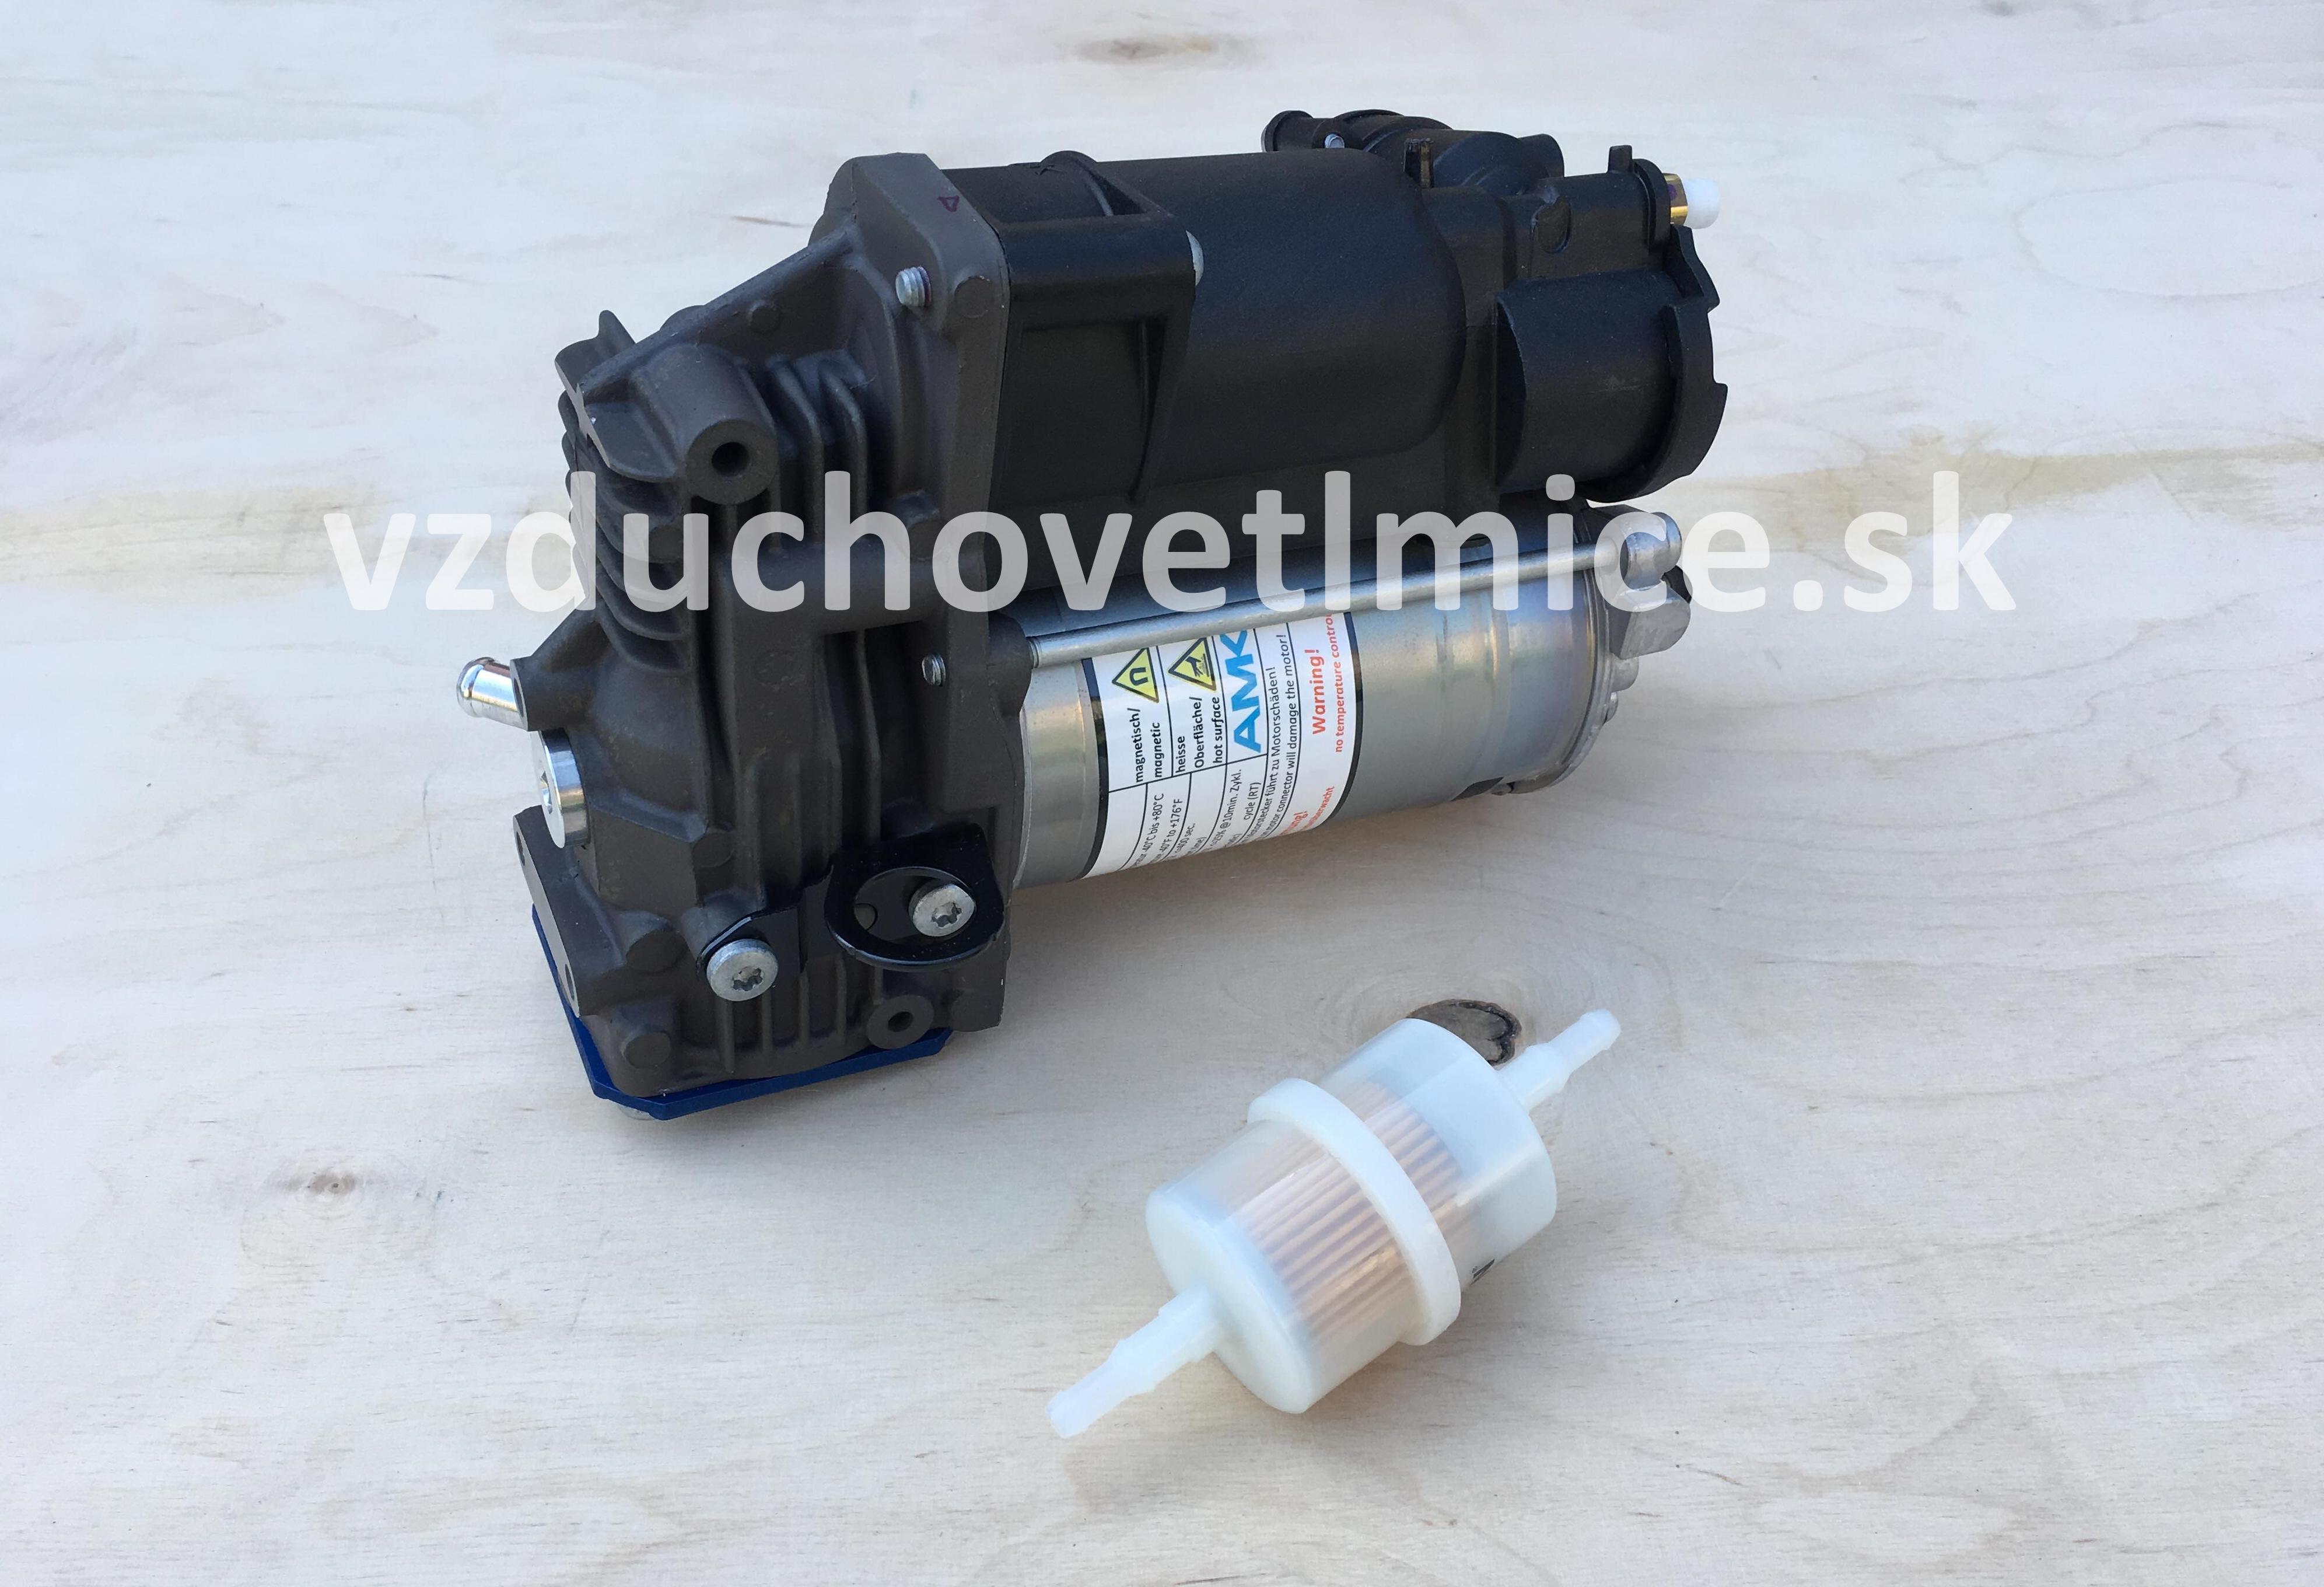 vzduchový kompresor podvozku AMK Mercedes Benz ML-class W164